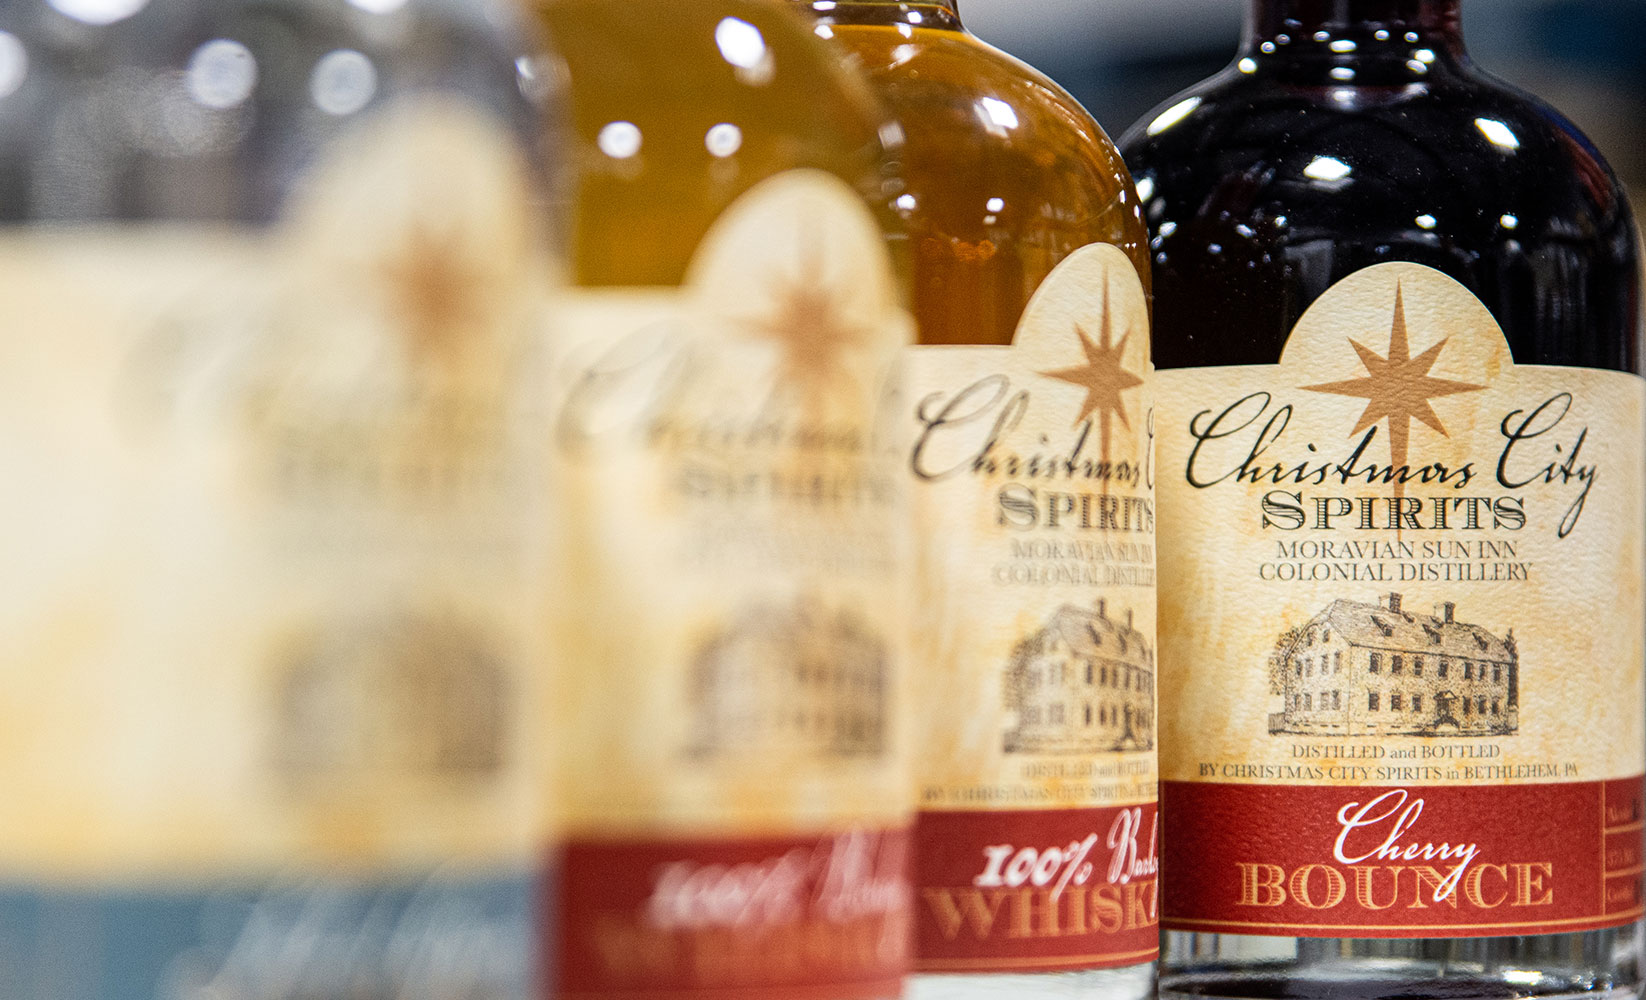 Christmas City Spirits Bottle sales